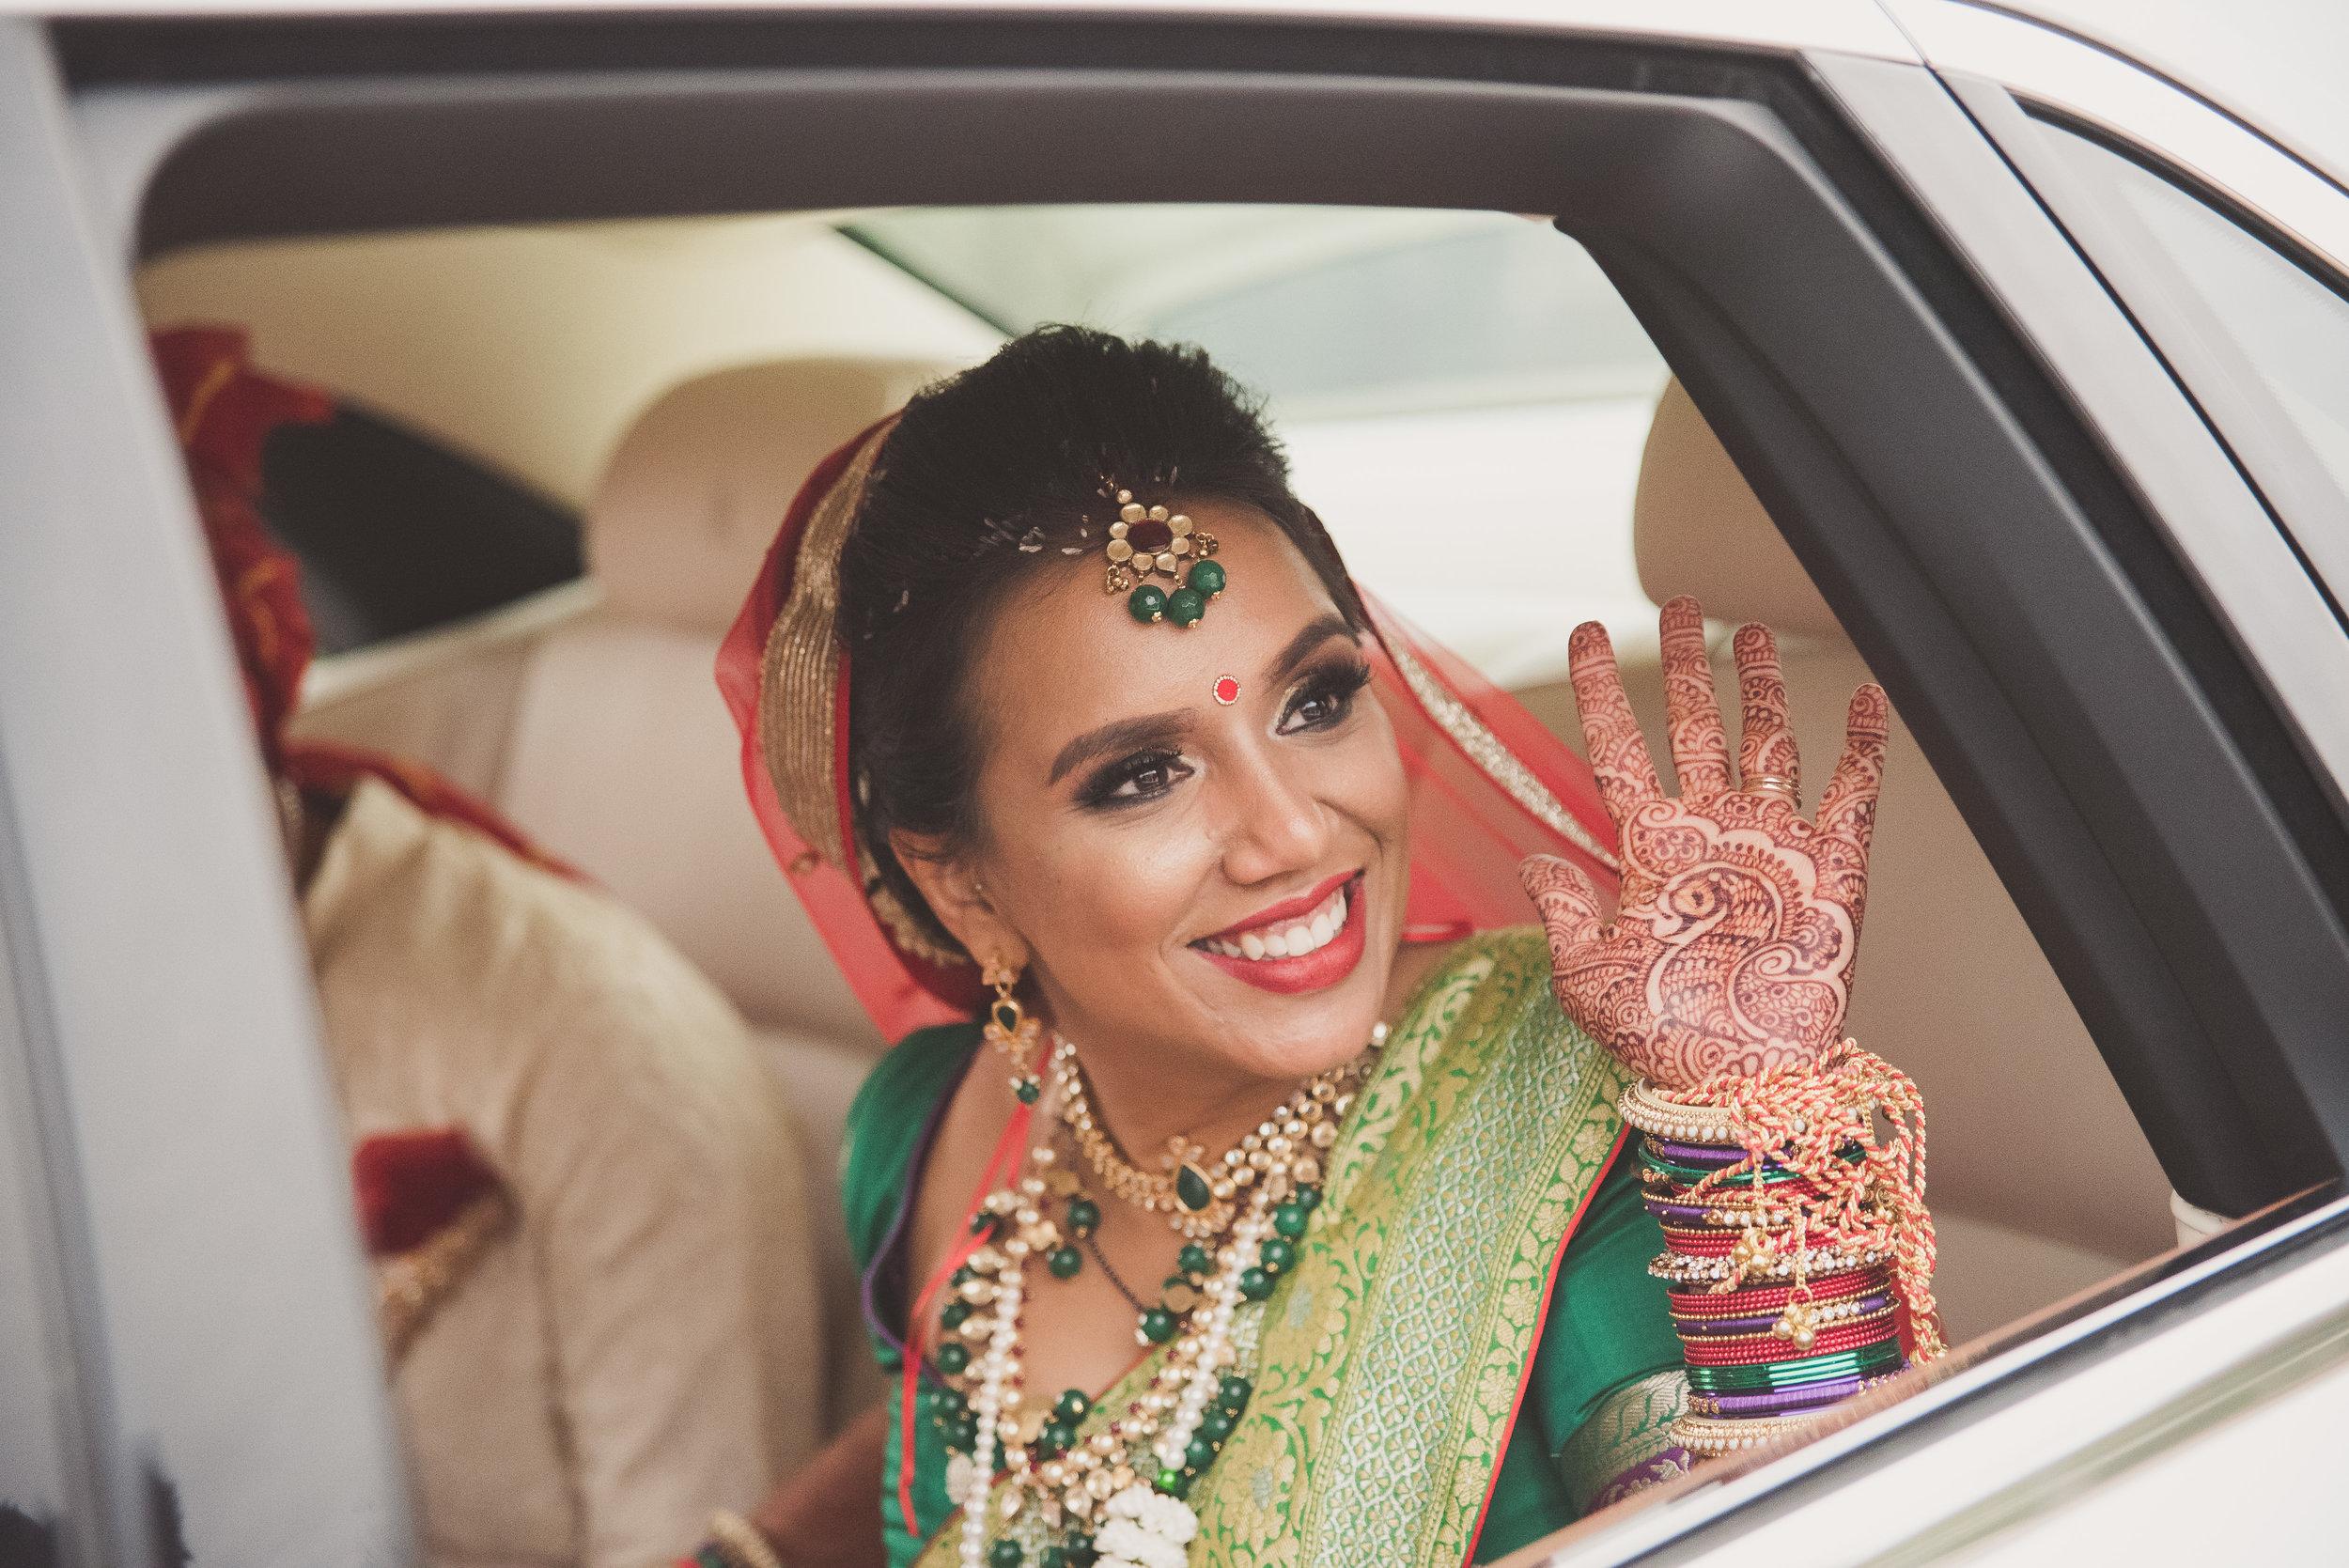 Hindu bride leaves the Oshwal Centre